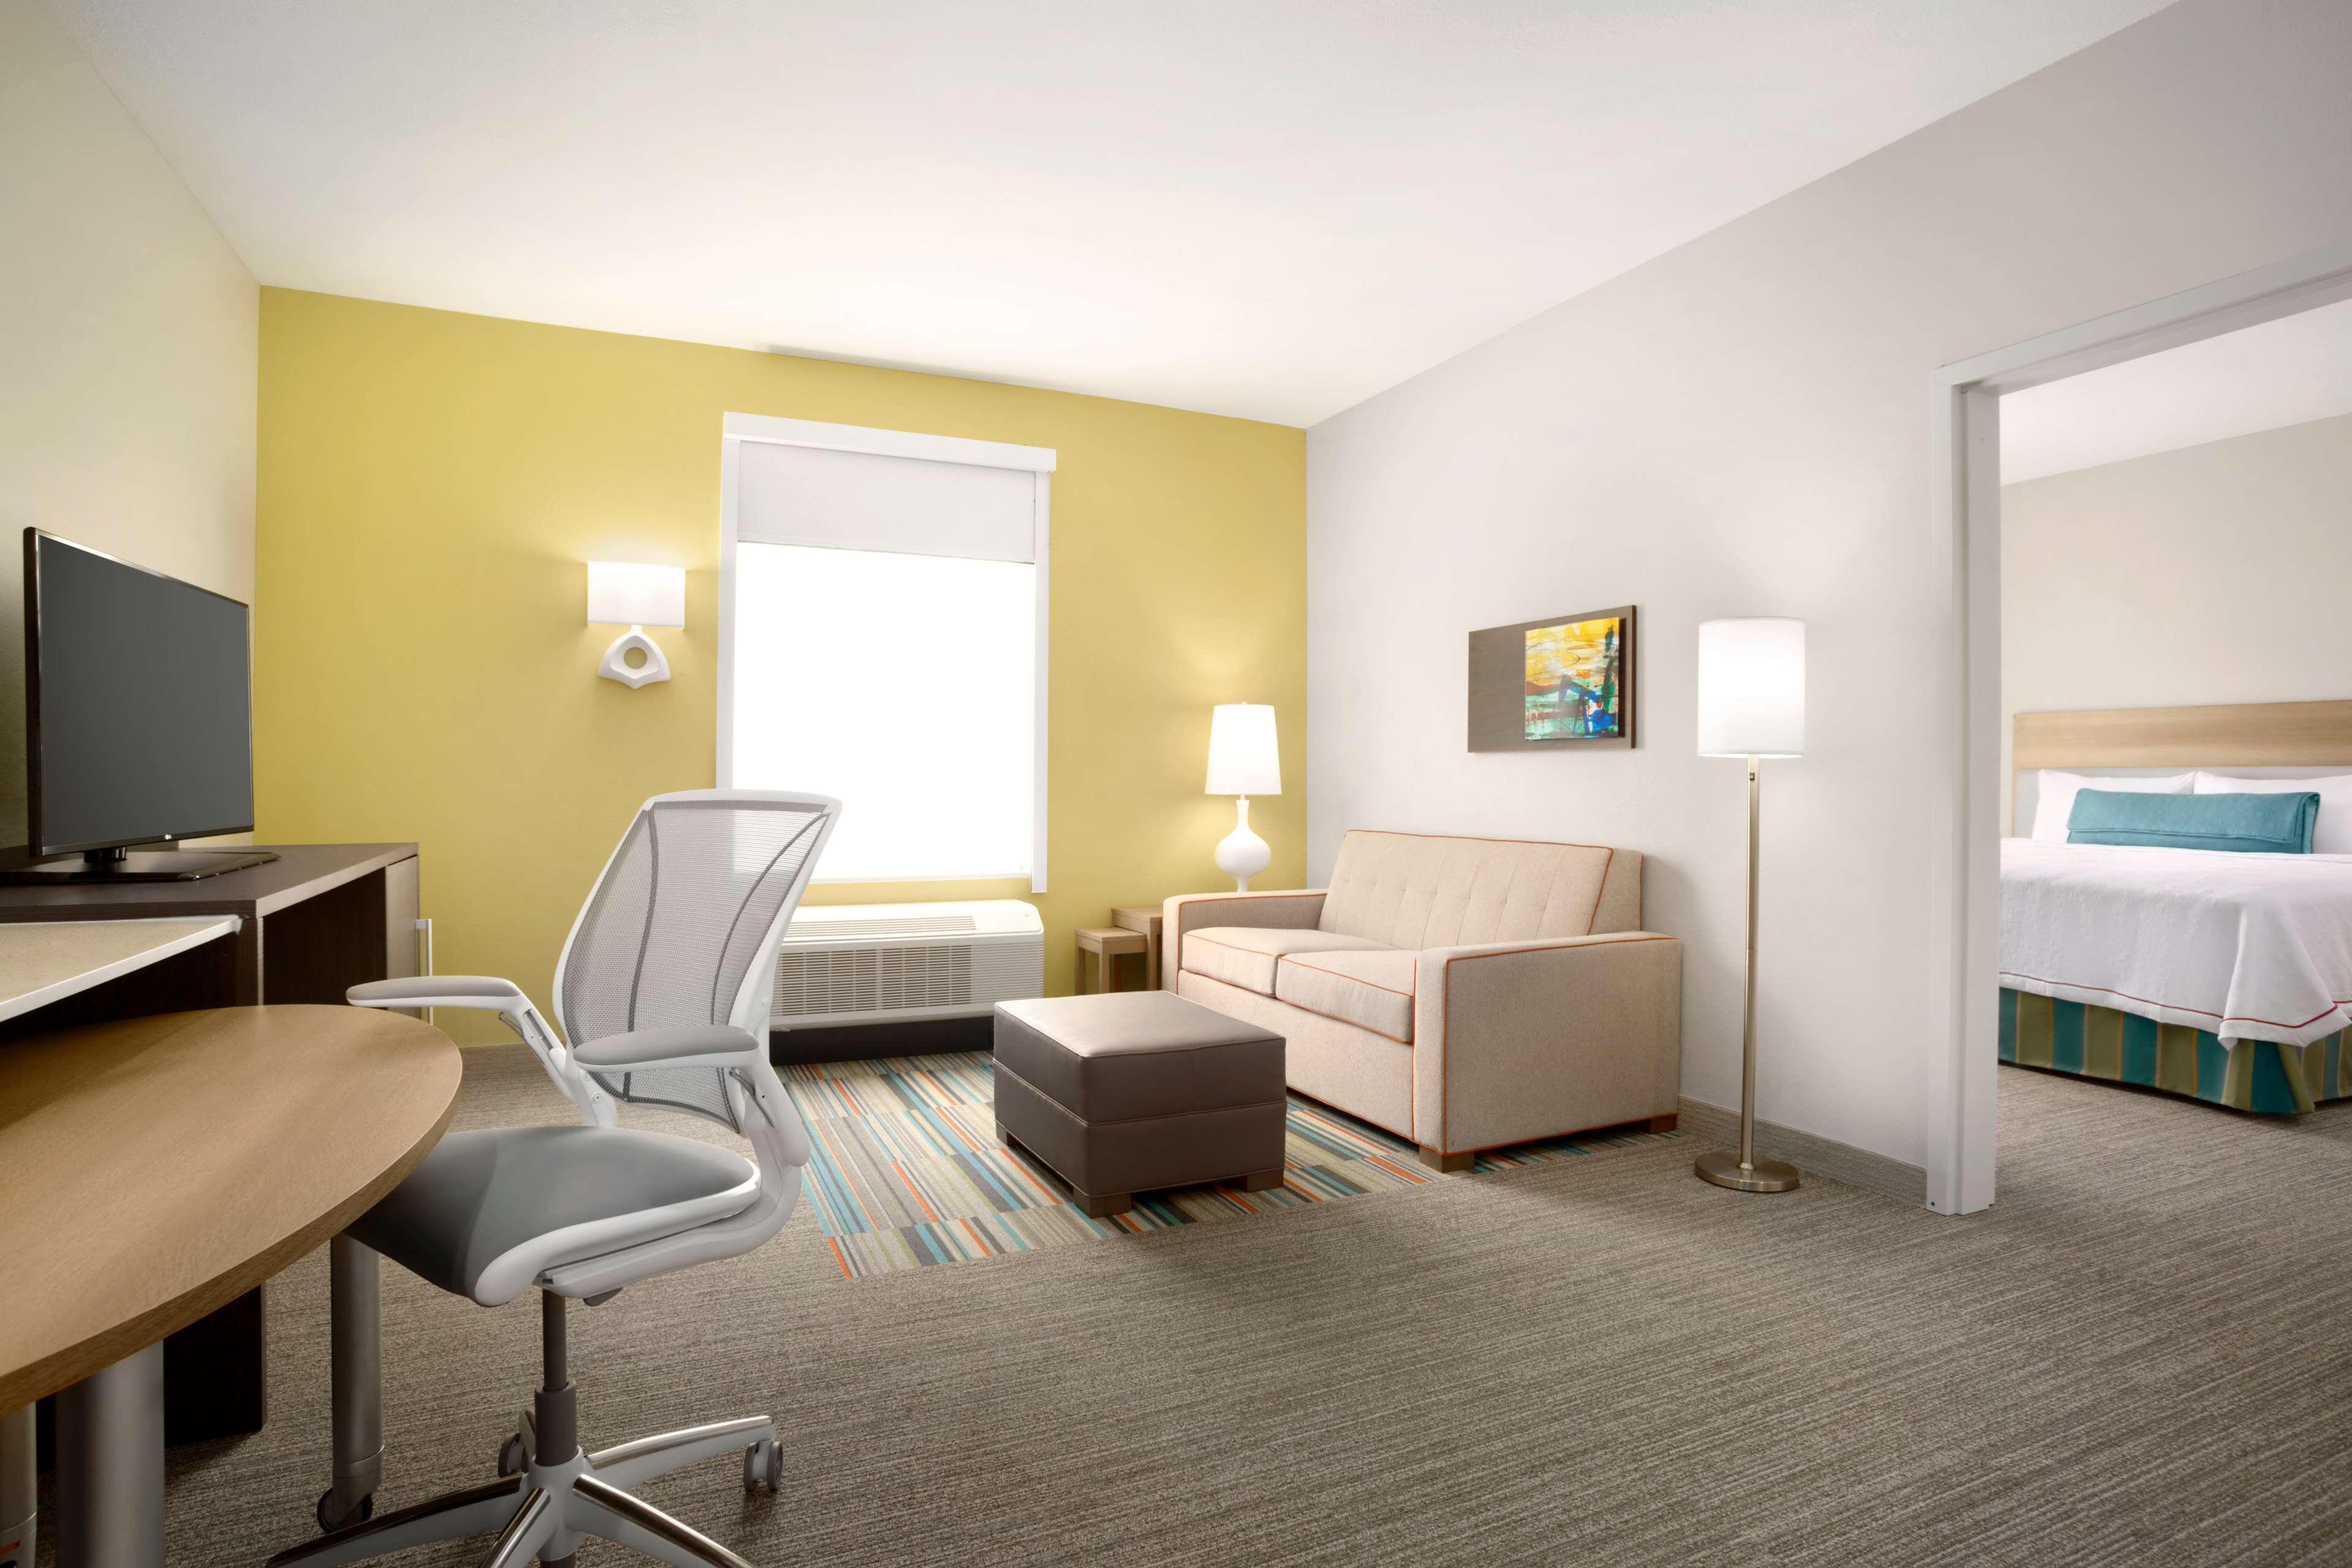 Home2 Suites by Hilton Houston/Webster image 13